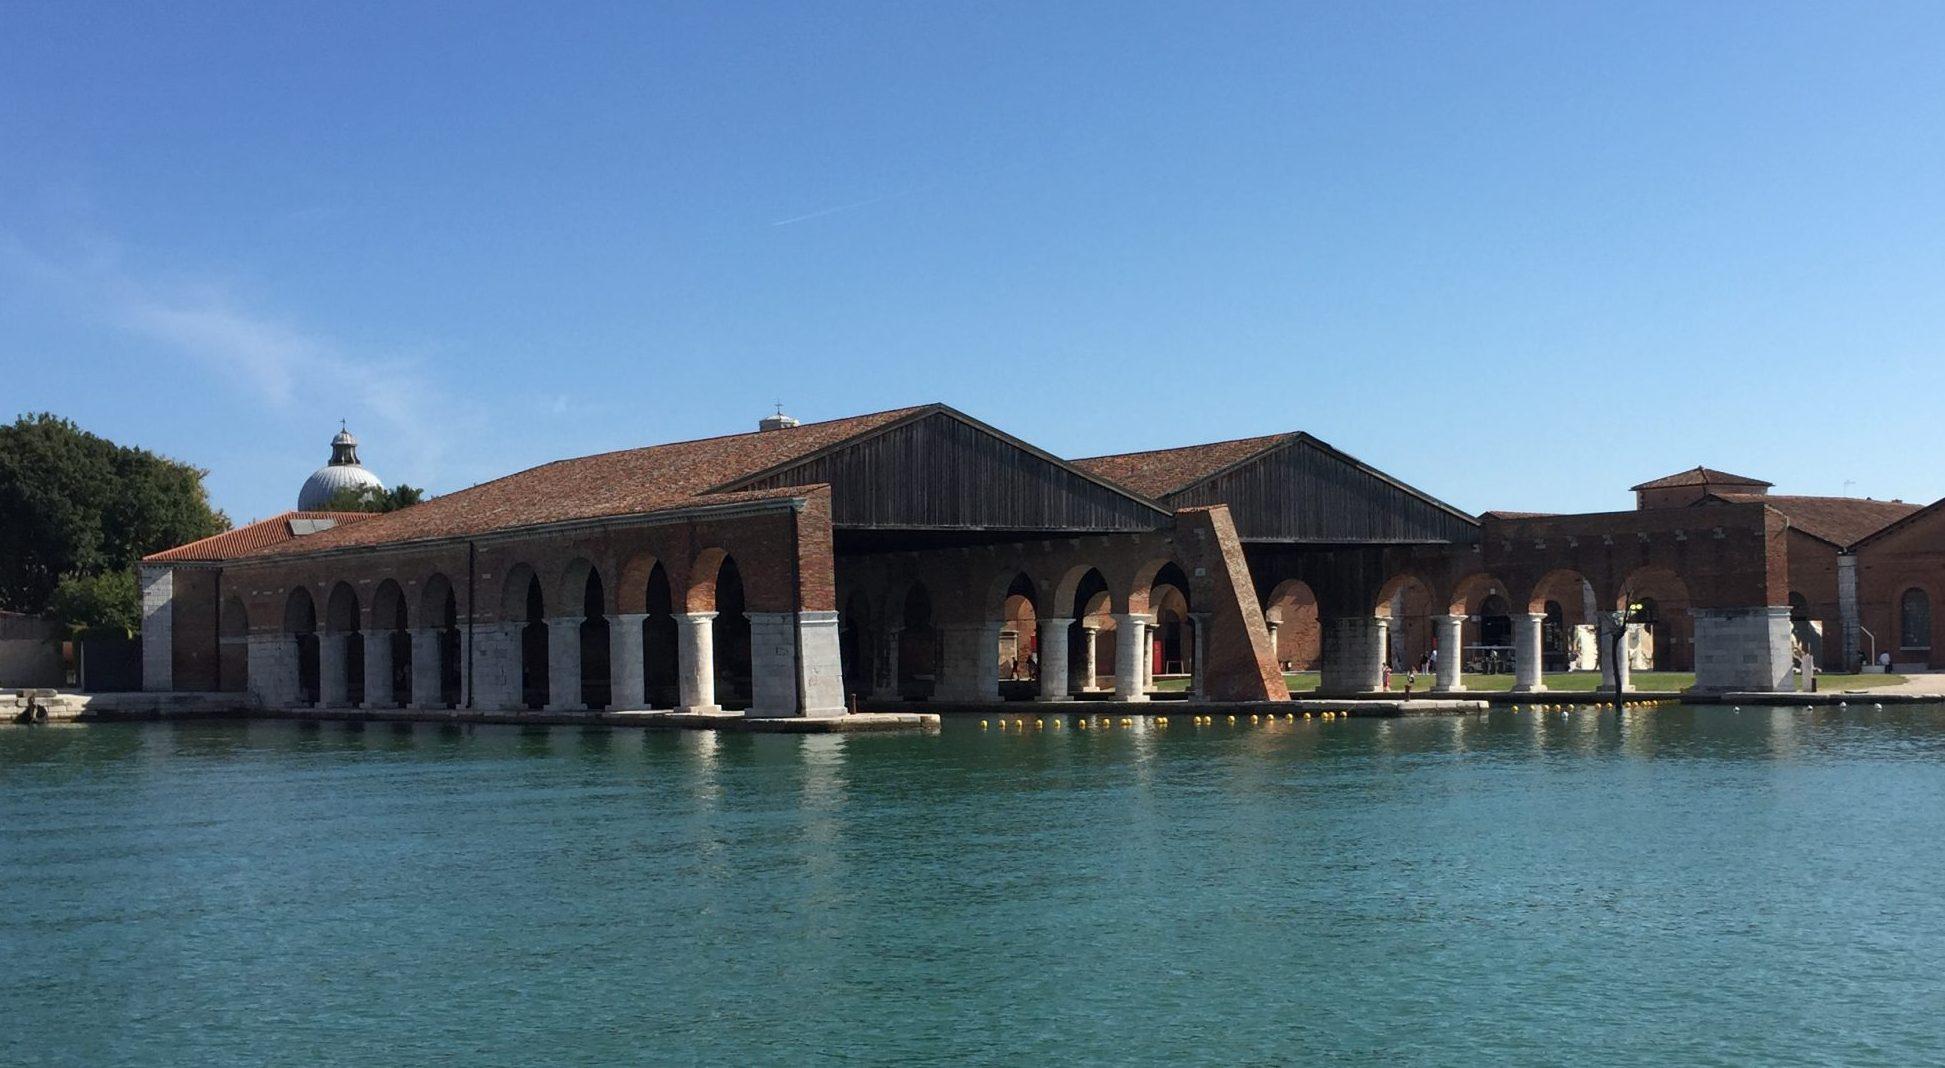 the Gaggiandre in the Arsenale of Venice